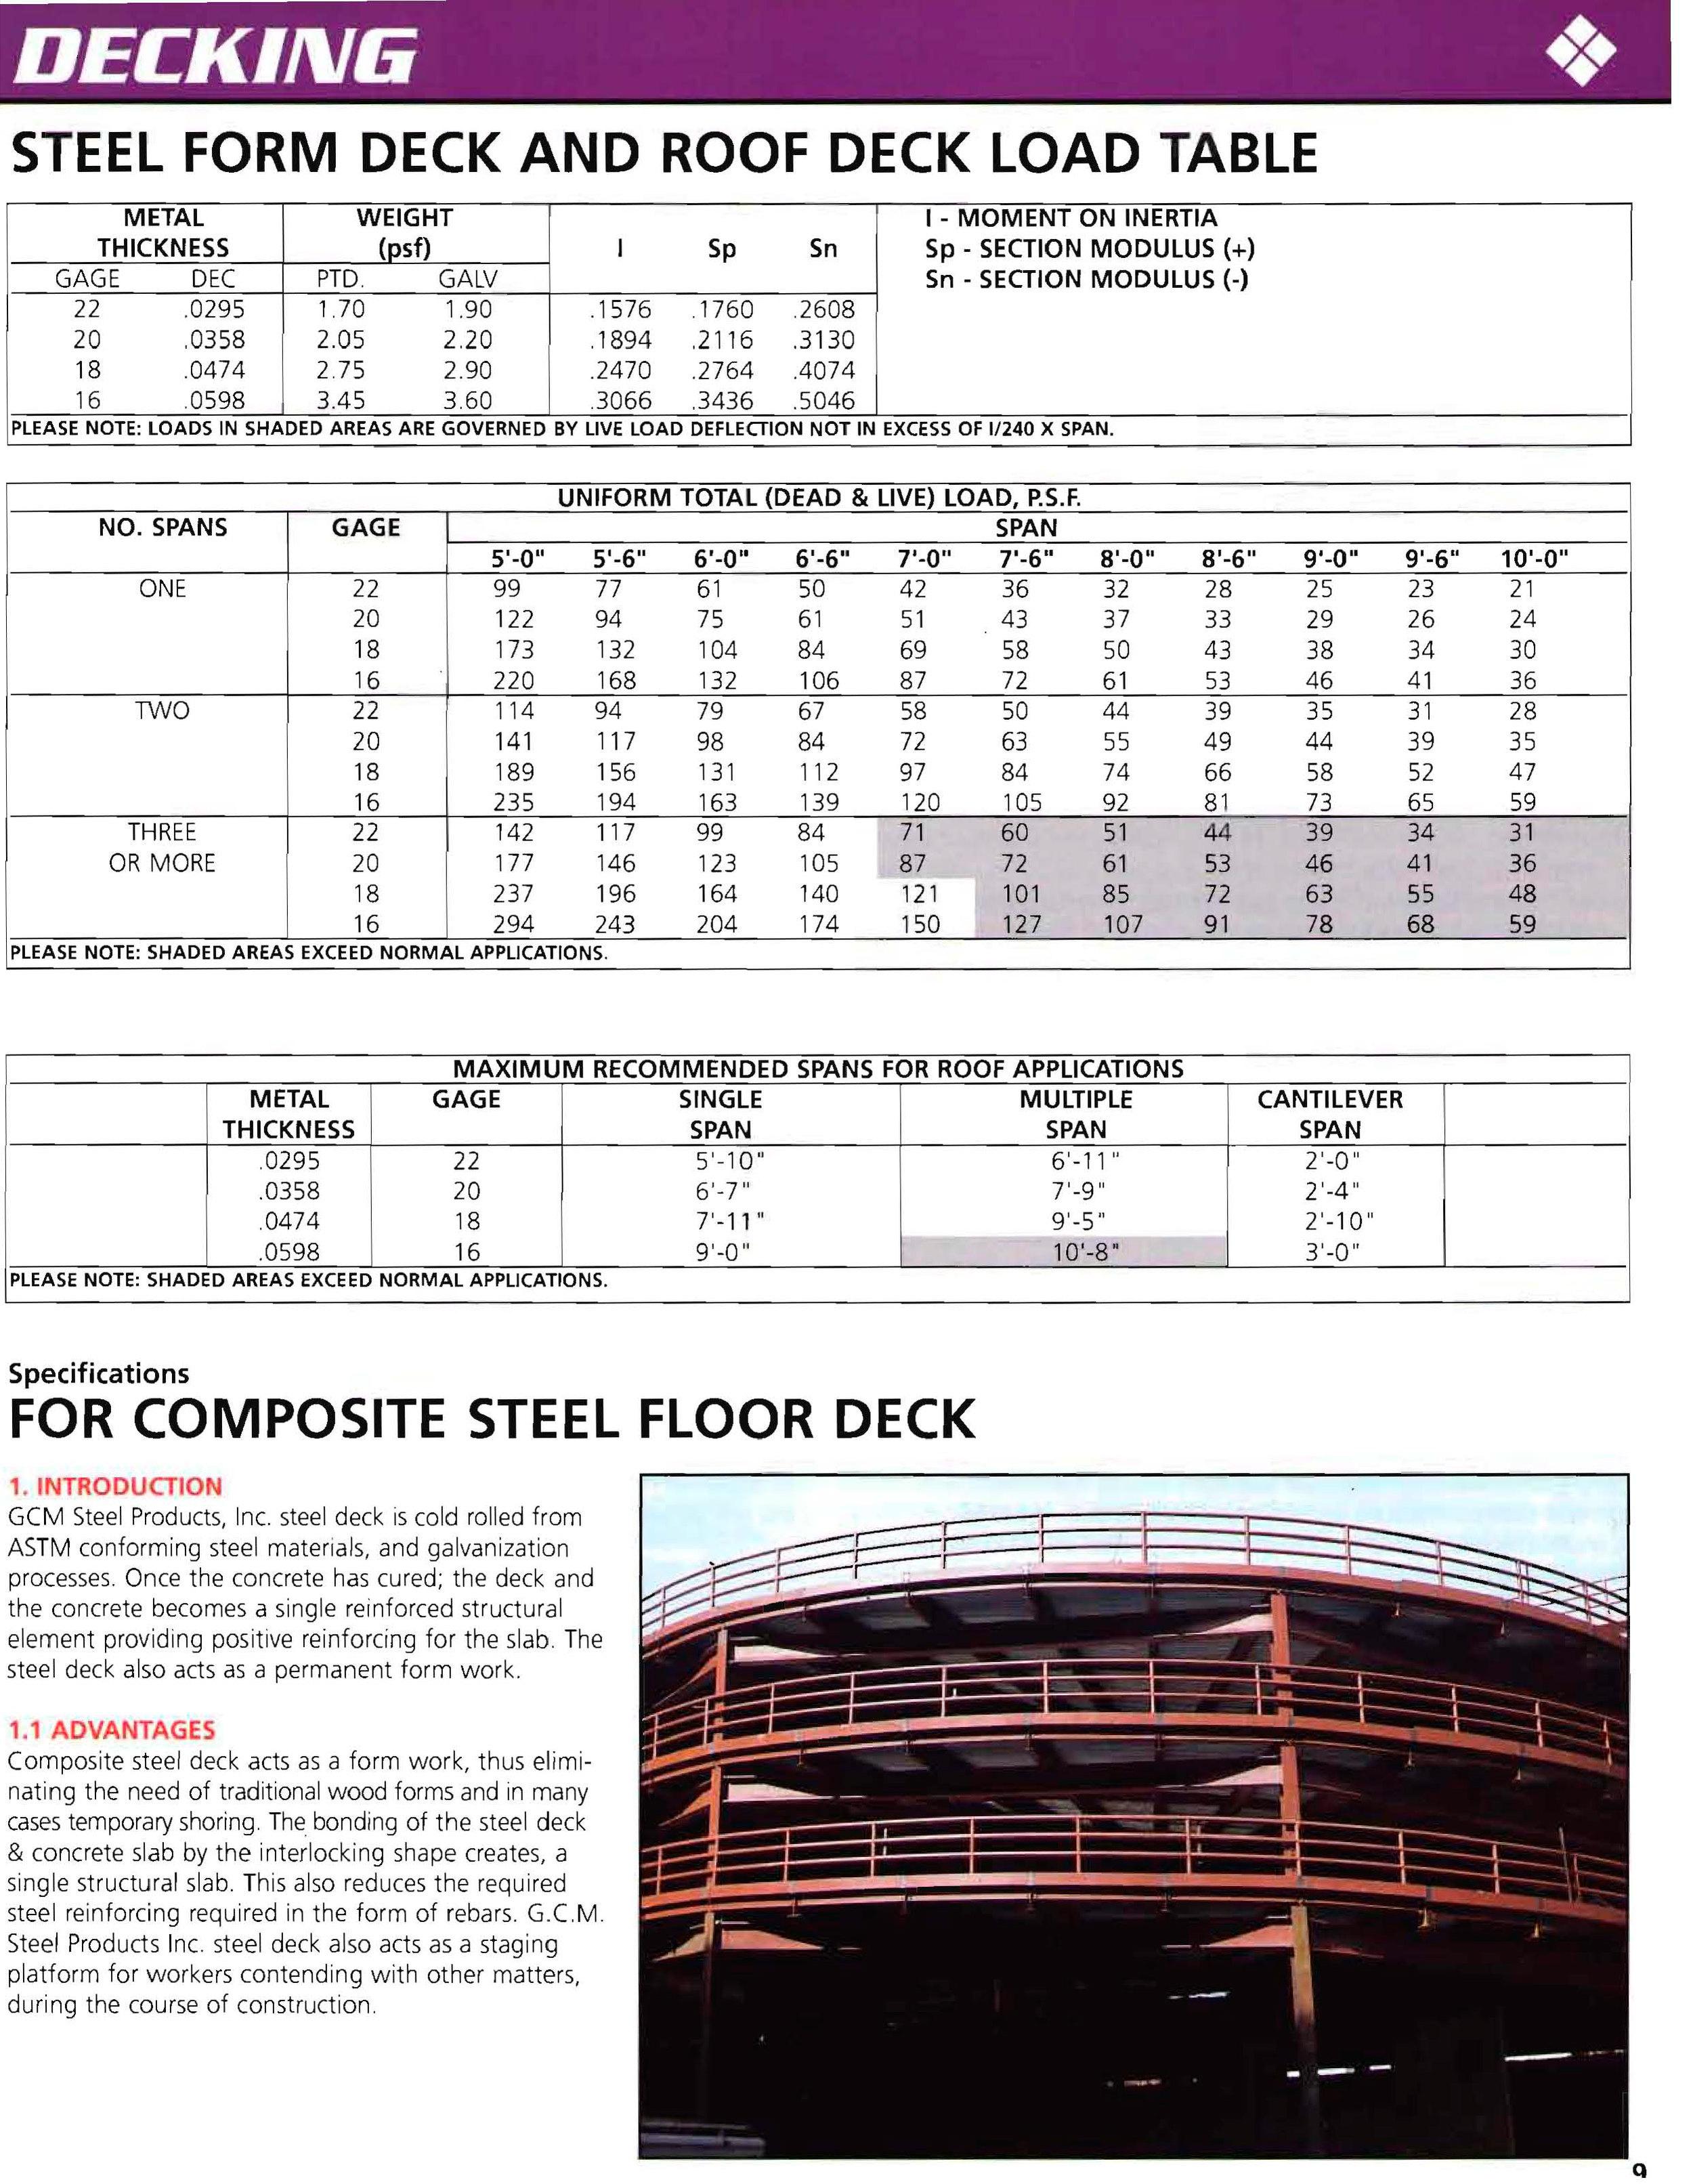 GCM-STEEL-Deck-Cut-Sheets-4.jpg